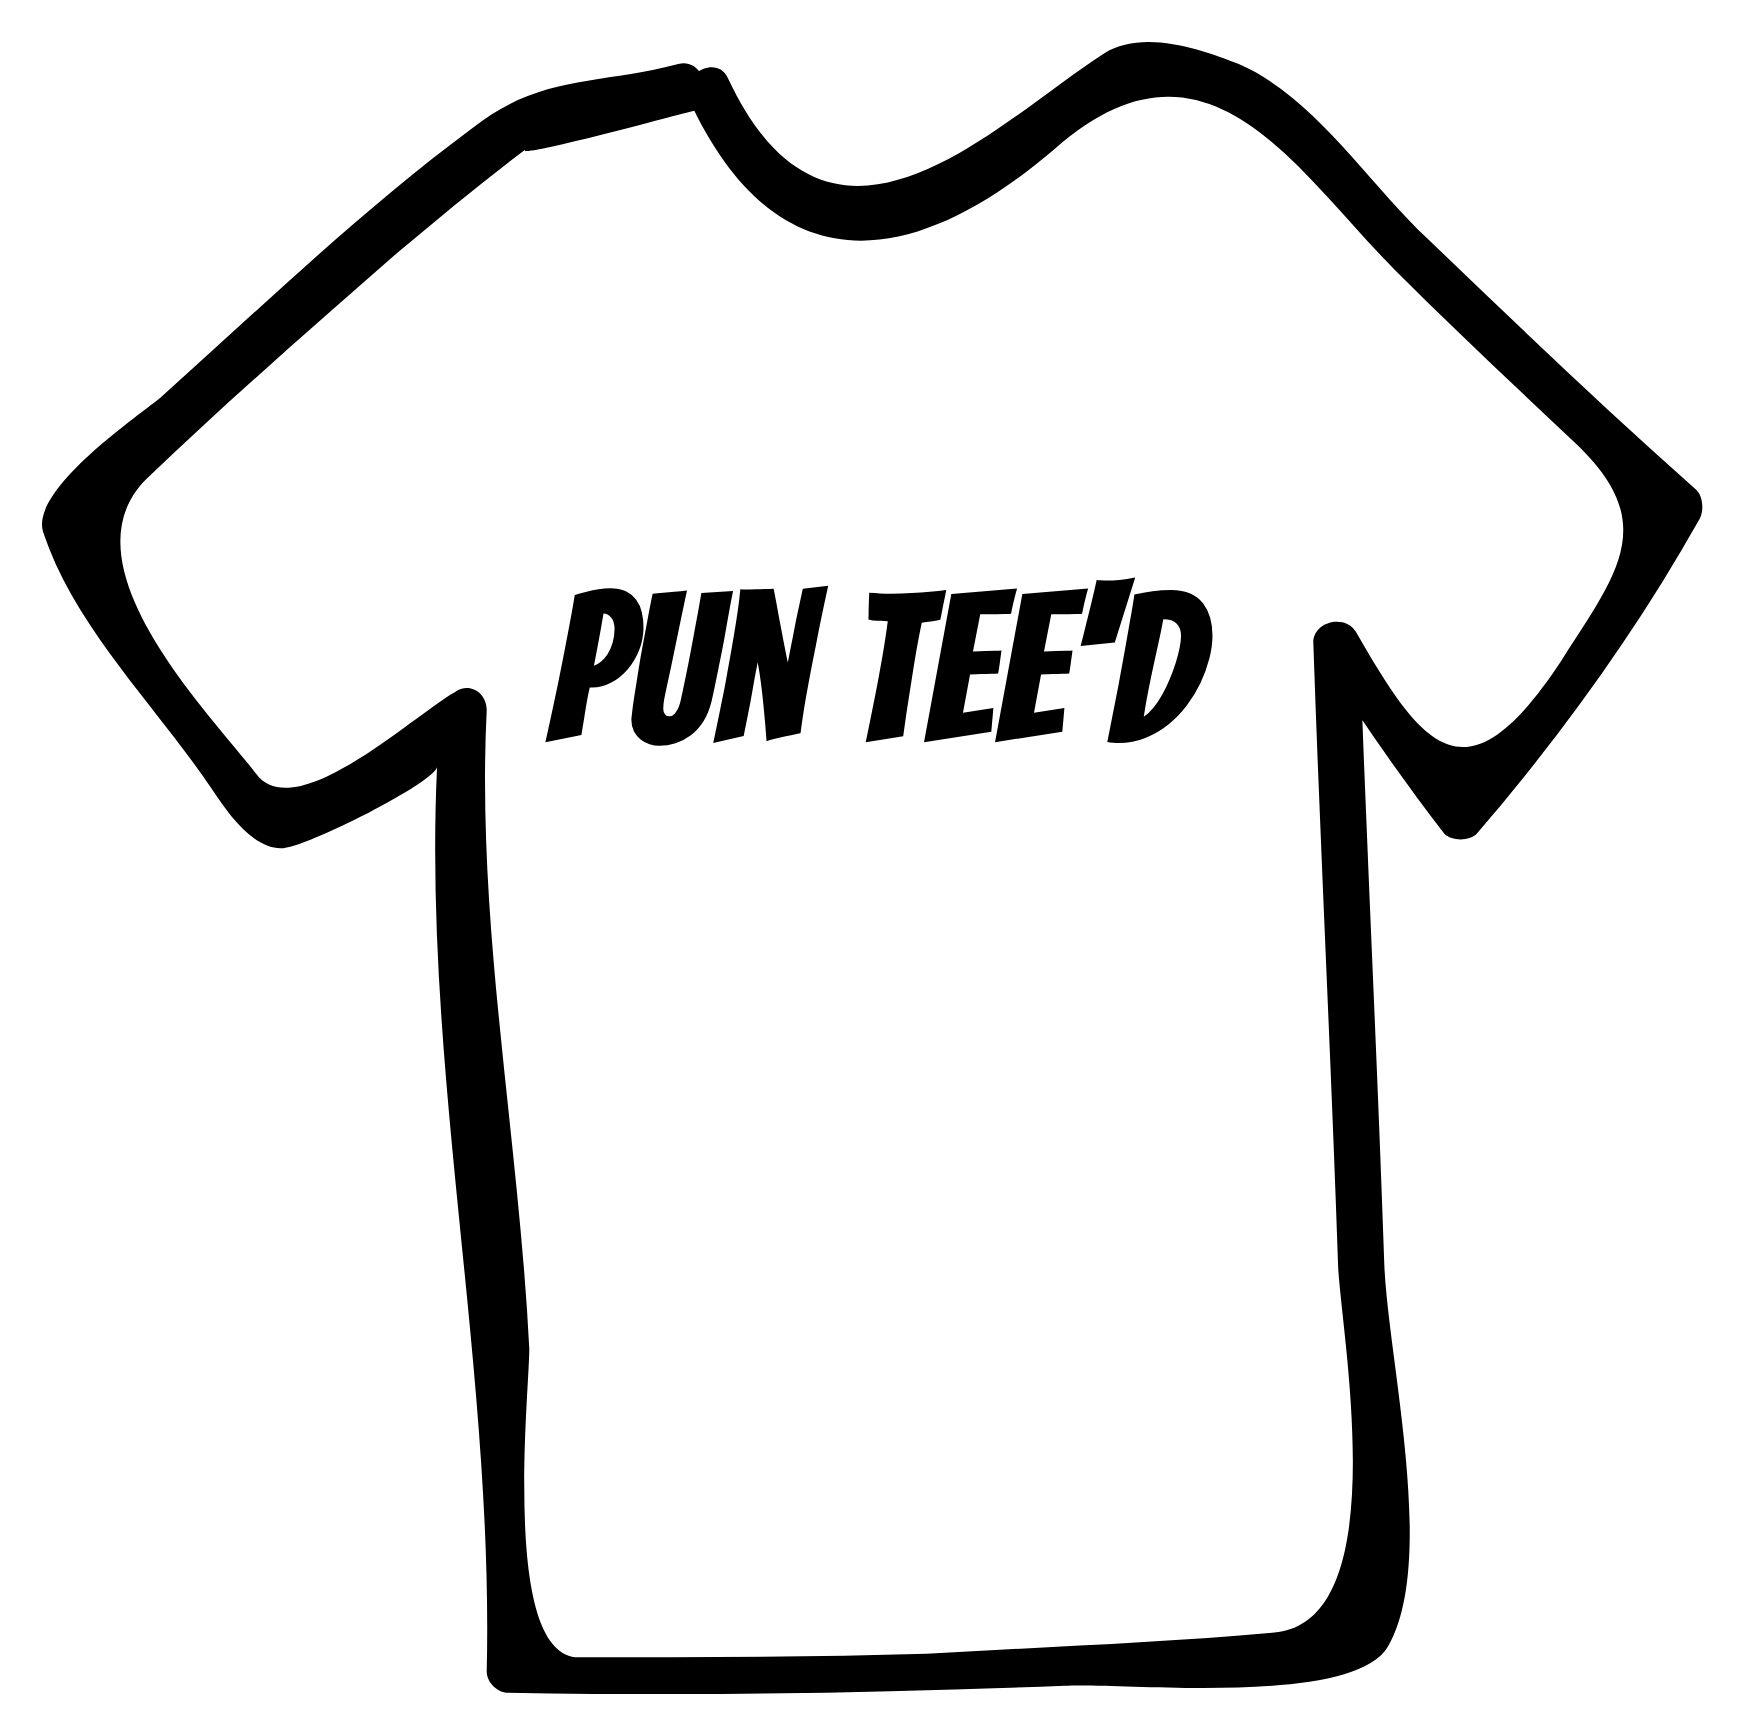 PunTeed